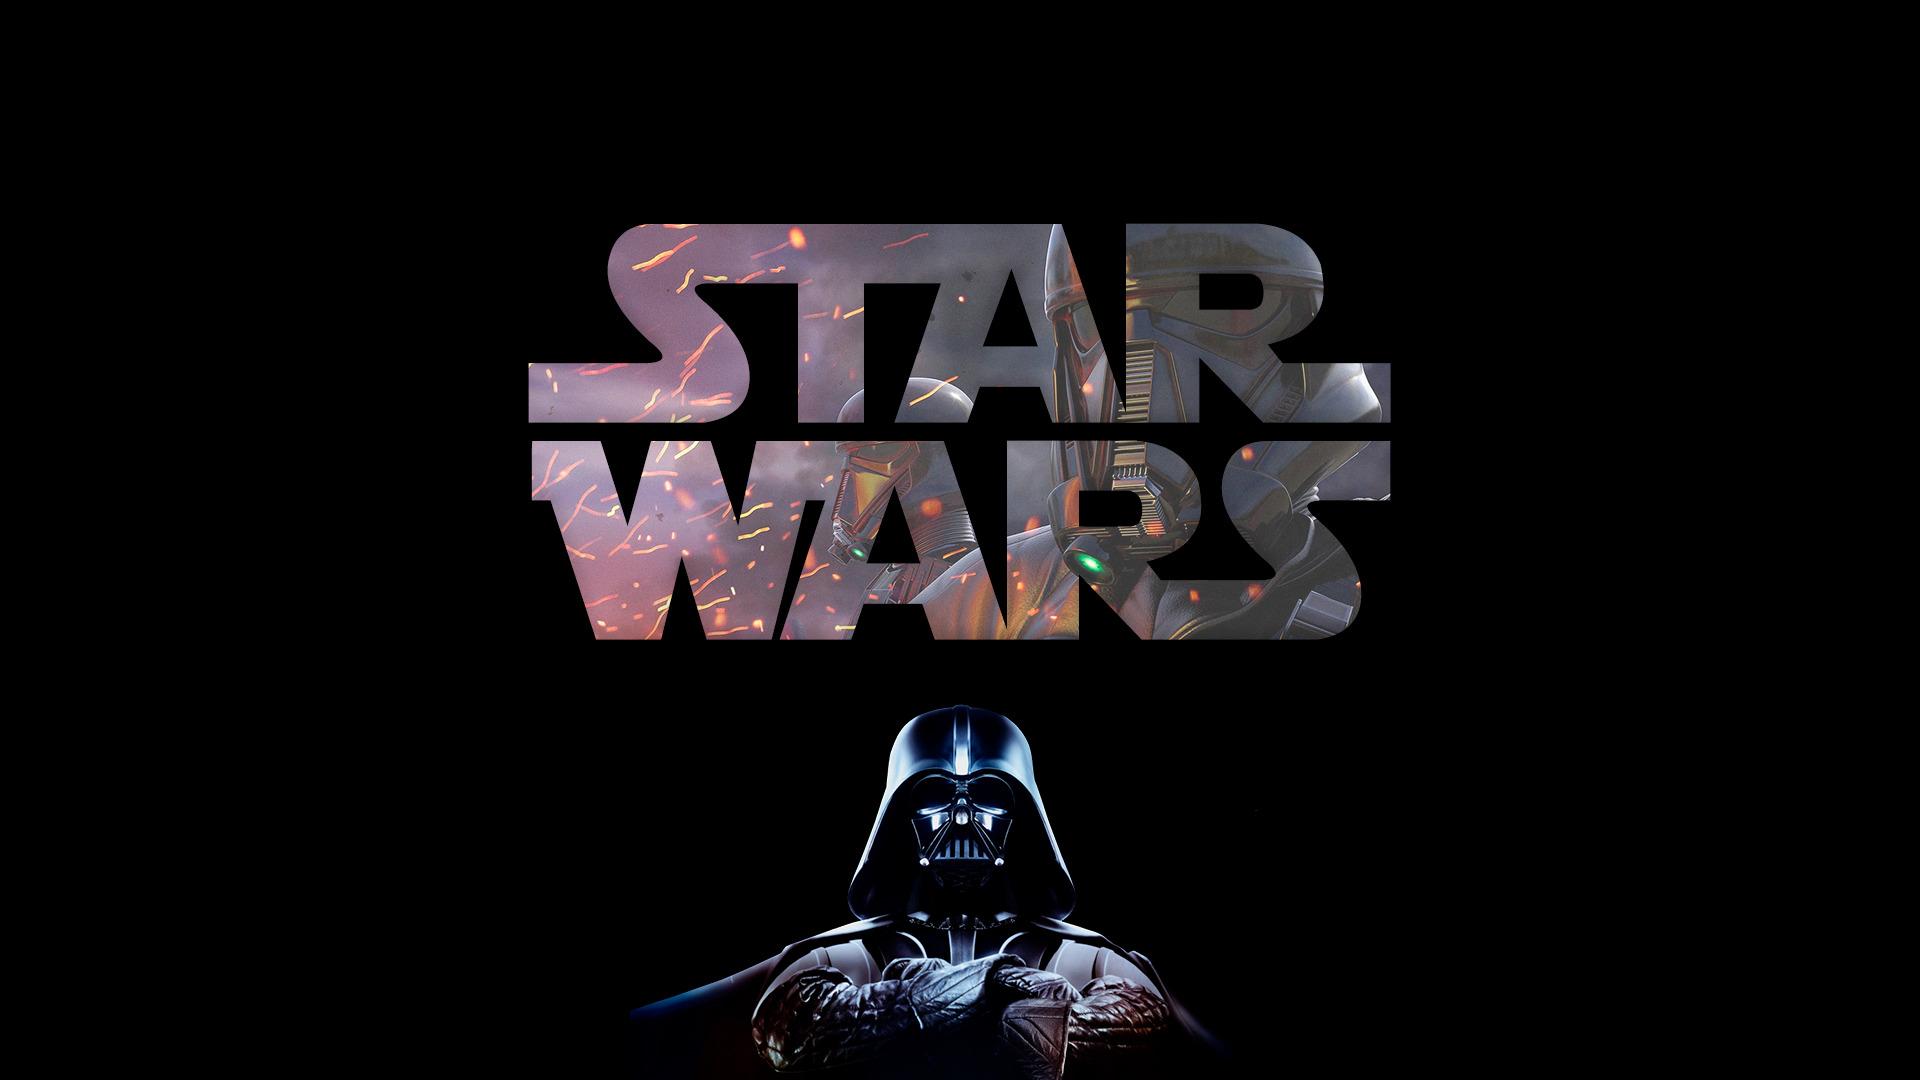 Wallpaper 1920x1080 Px Darth Vader Star Wars Typography 1920x1080 Wallpaperup 1261433 Hd Wallpapers Wallhere